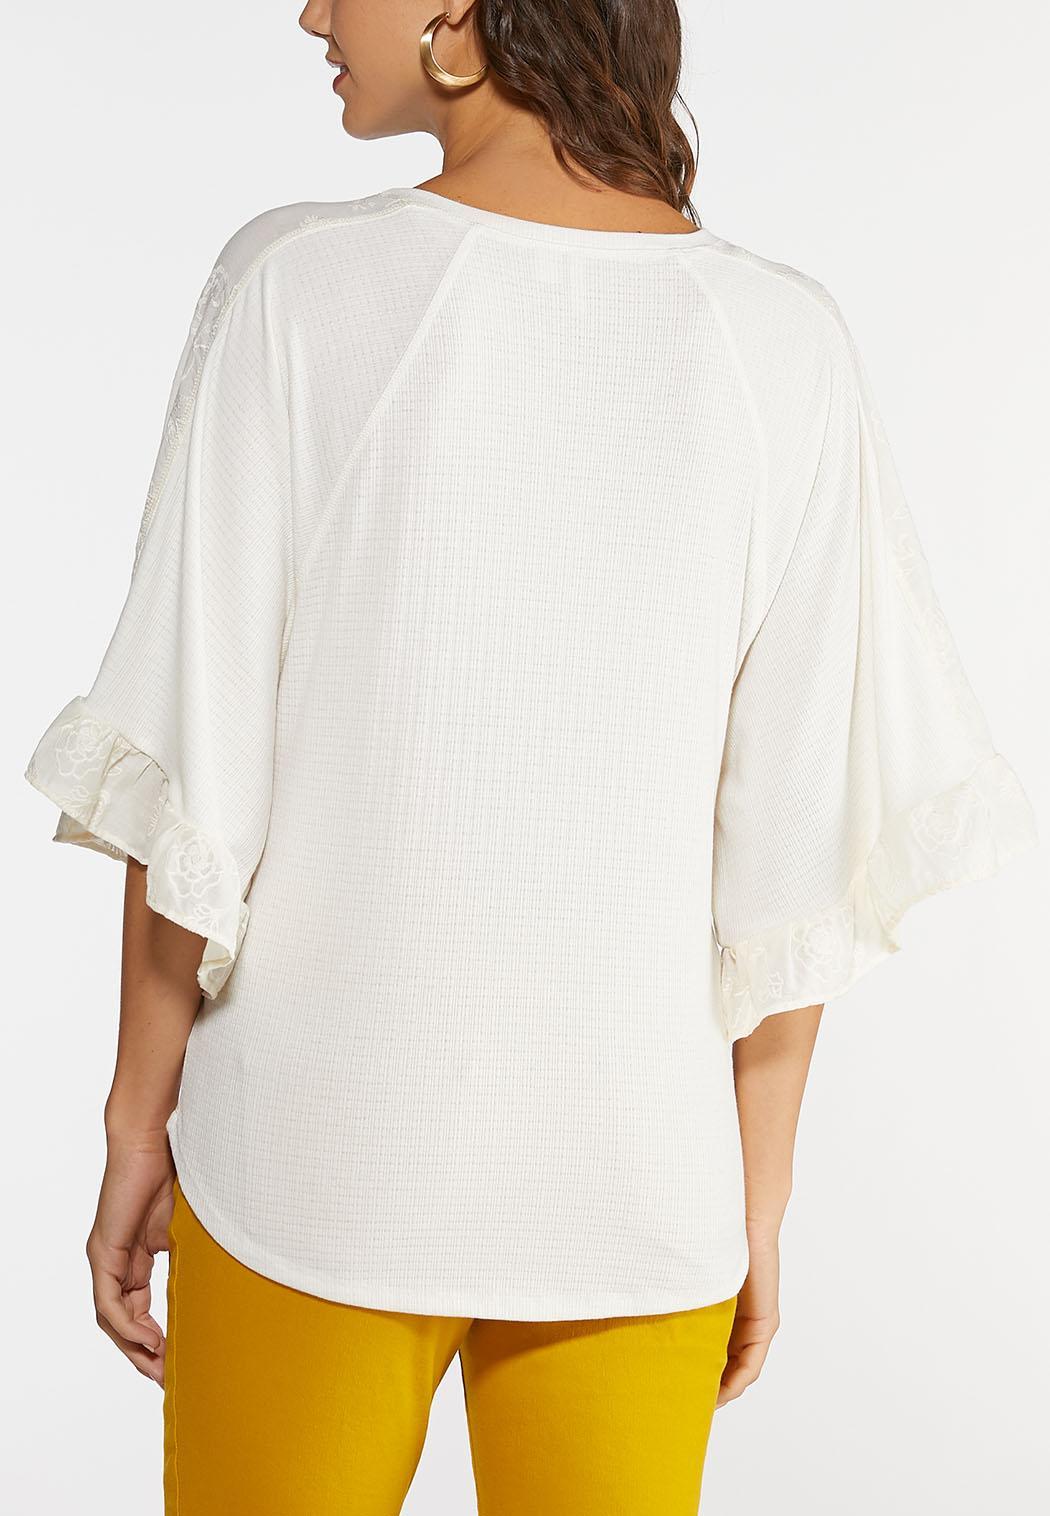 Embroidered Flutter Sleeve Top (Item #44017283)